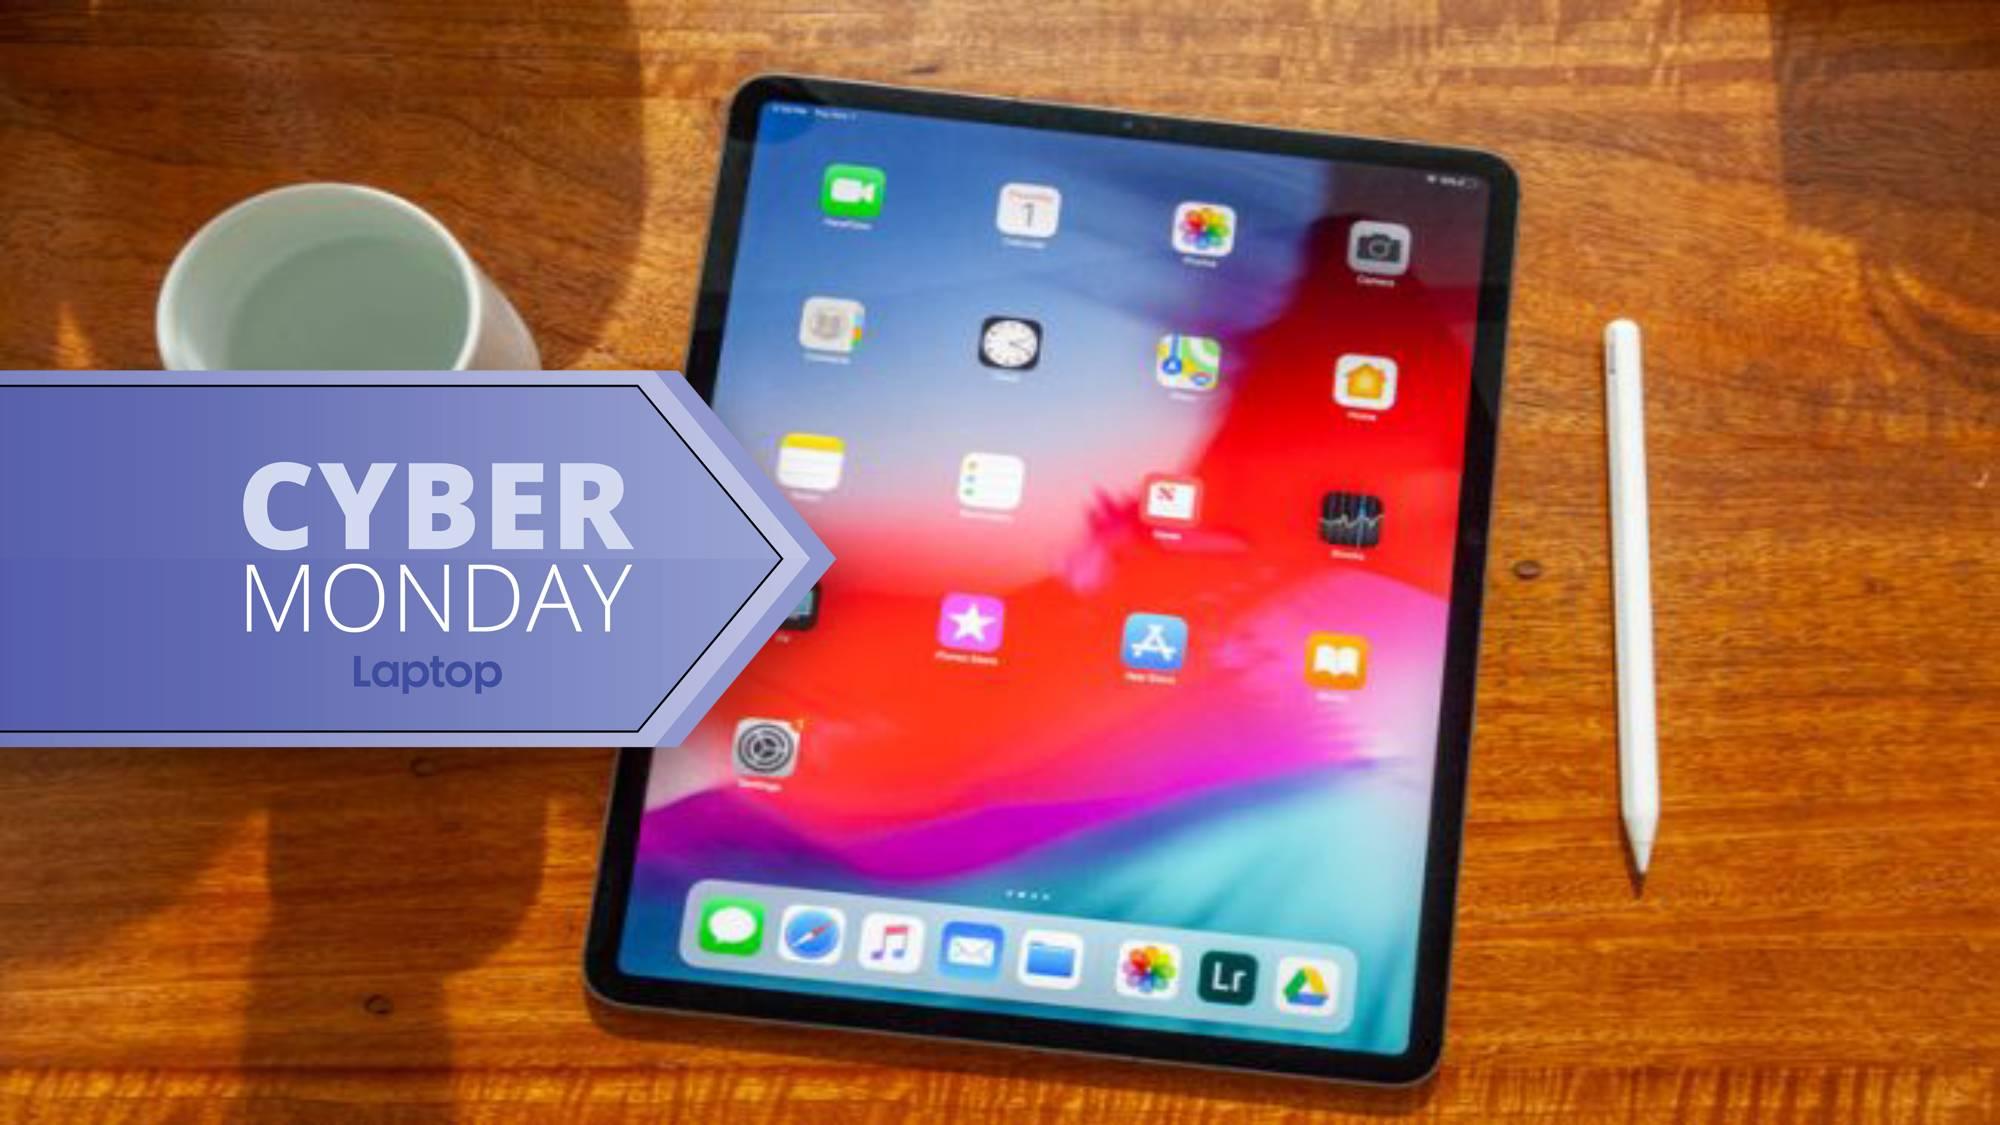 Best Ipad Cyber Monday Deals Of 2019 Laptop Mag